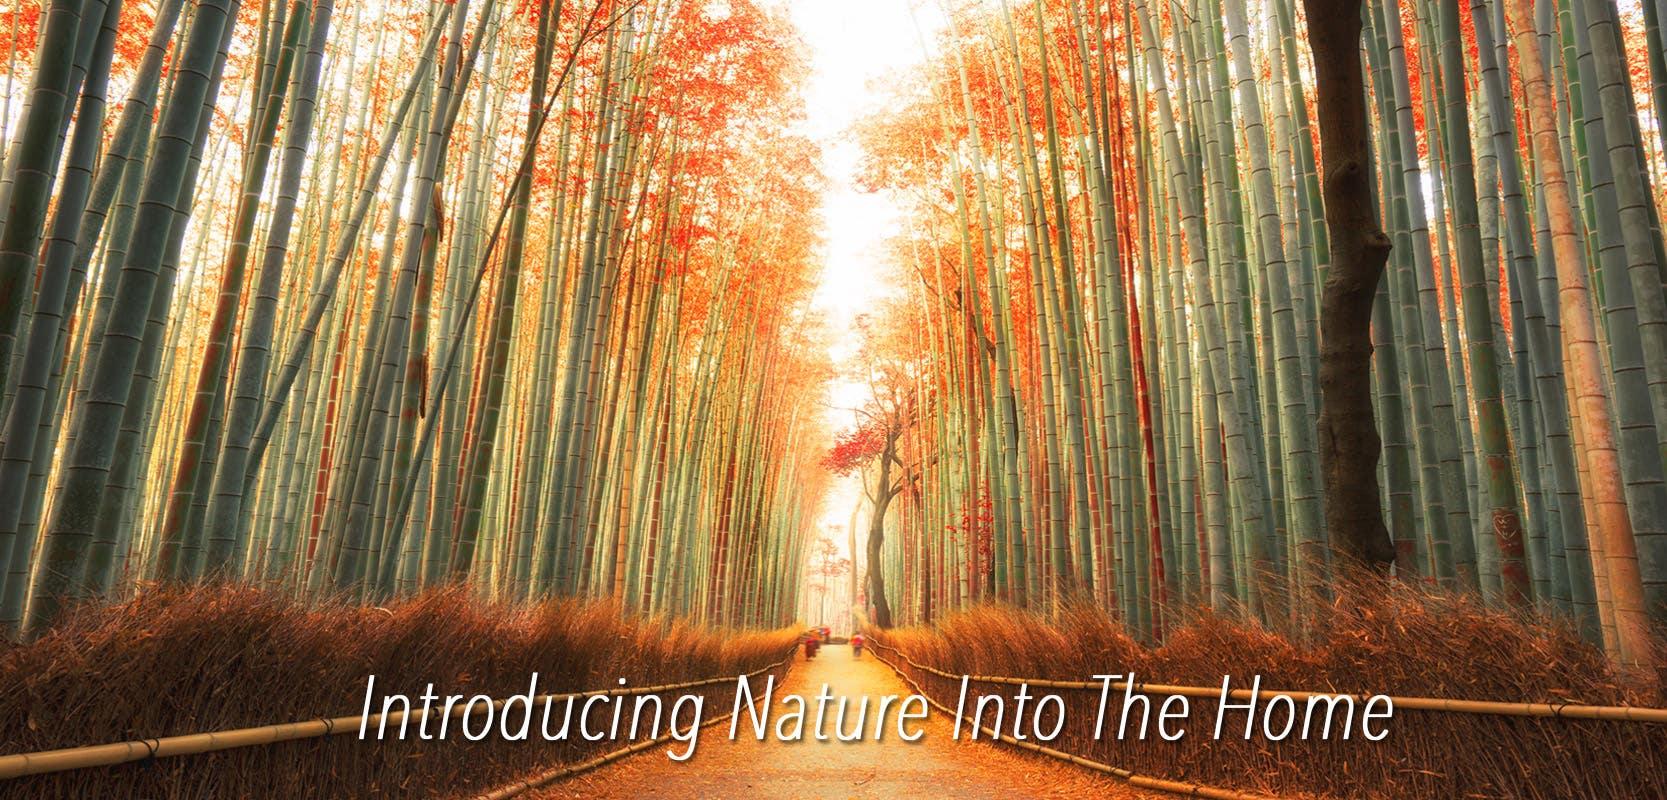 Introducing_Nature_Into_The_Home_shikifuton_mattress